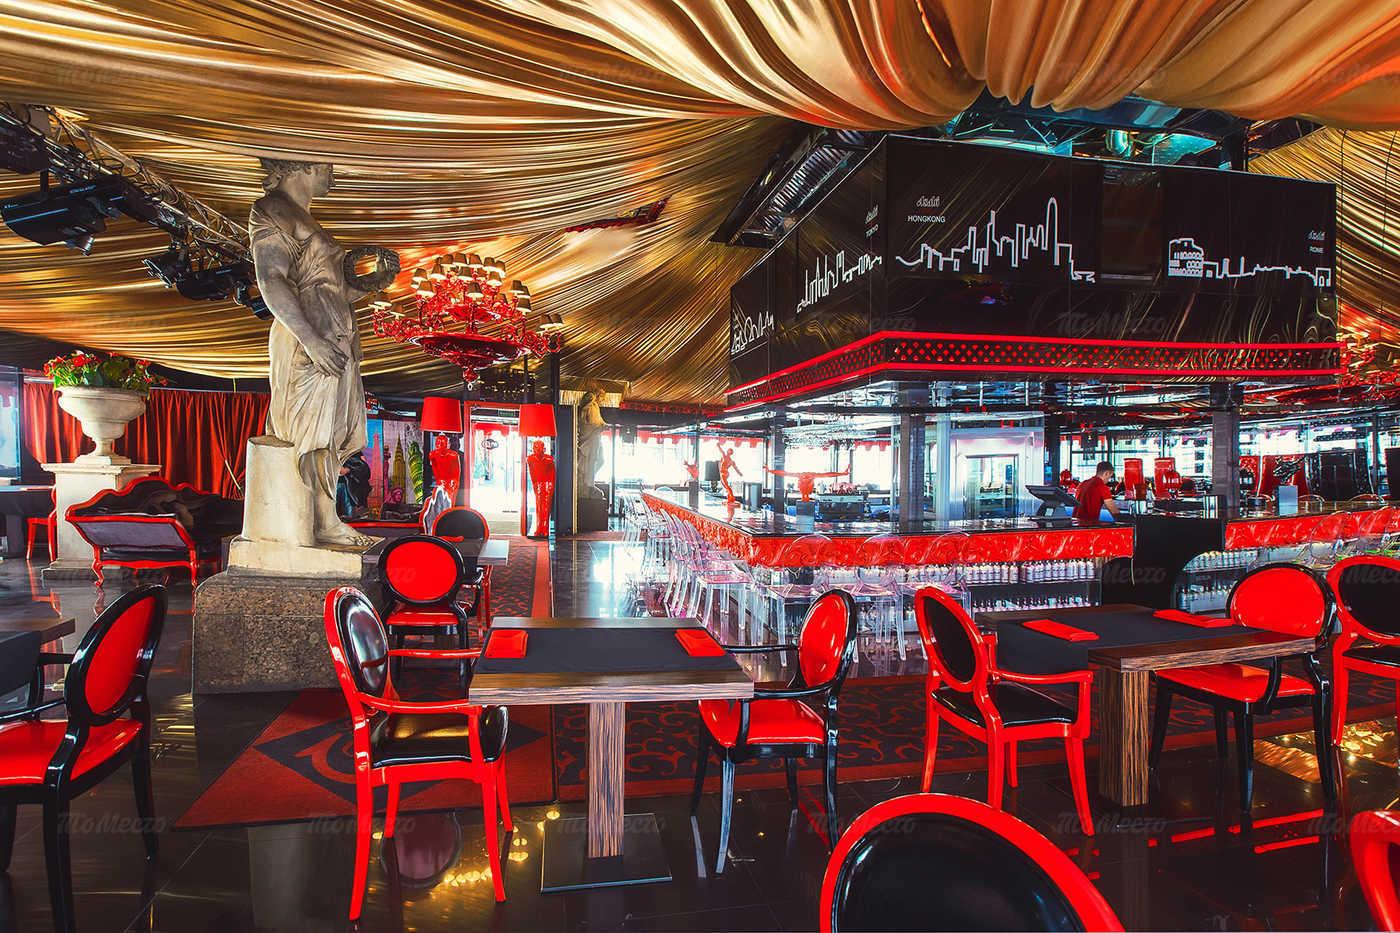 Меню бара, ресторана Глосс Кафе (Gloss cafe) на Невском проспекте